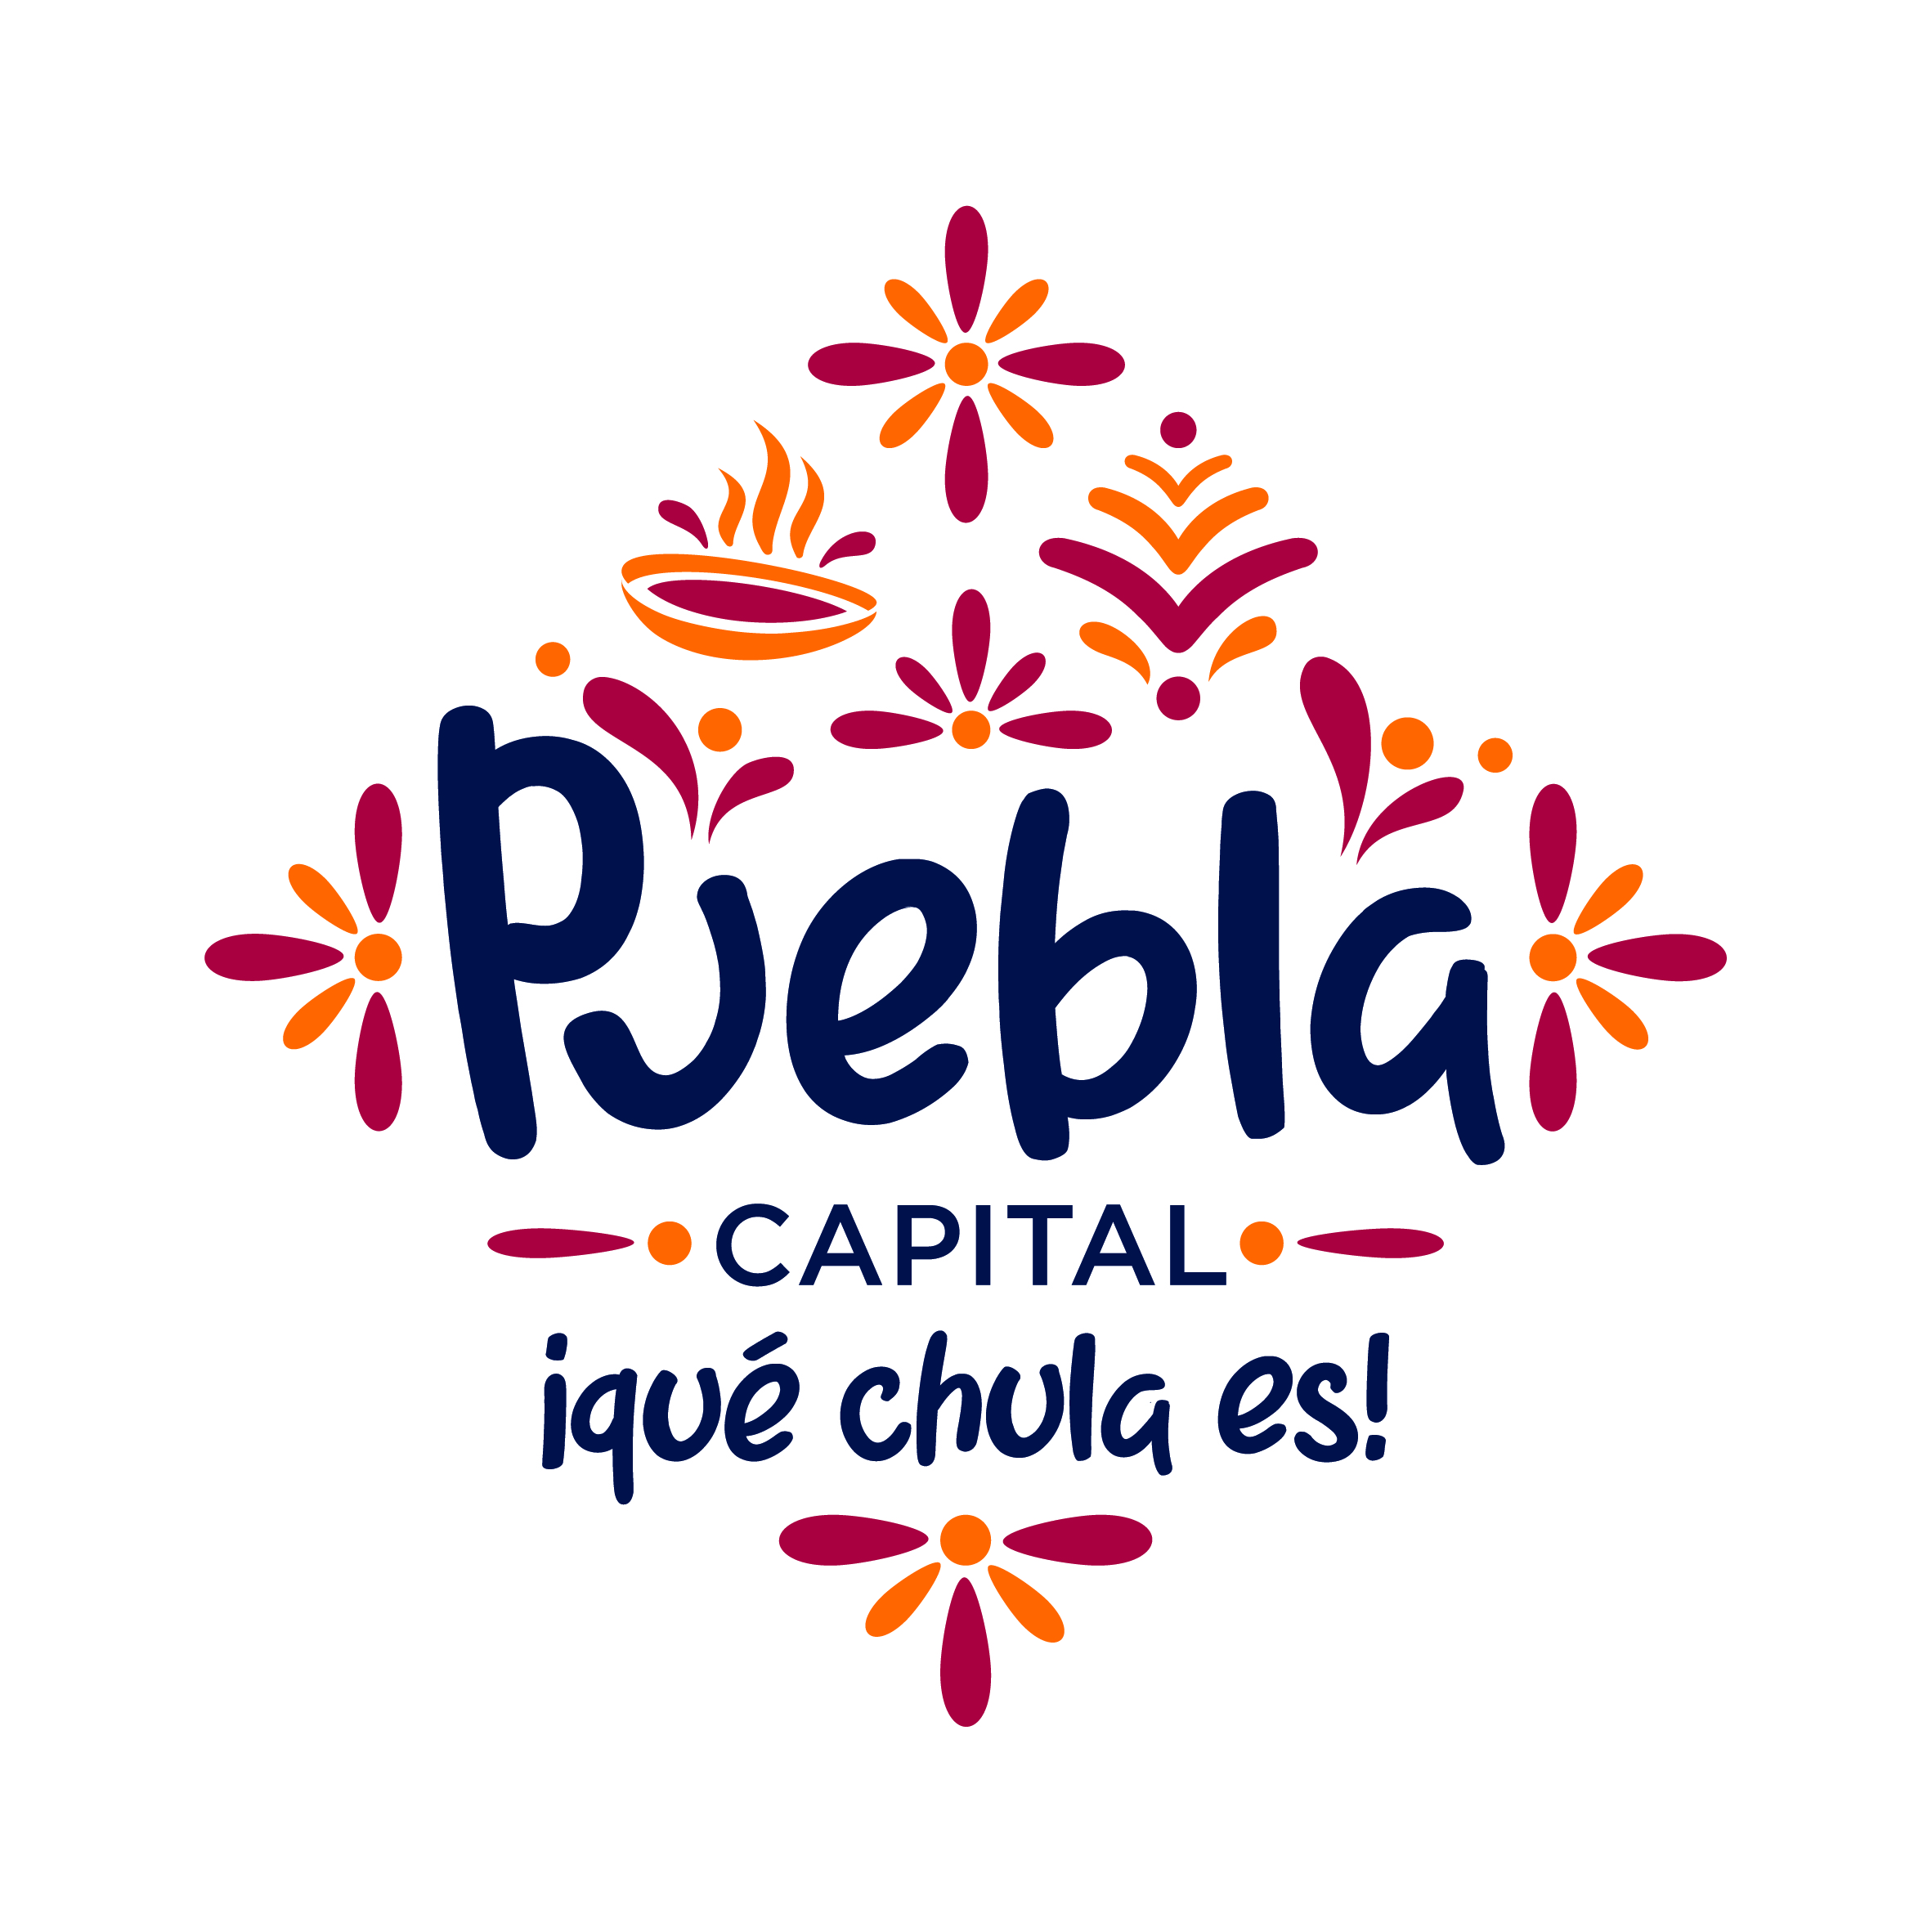 Banner Puebla que chulaes